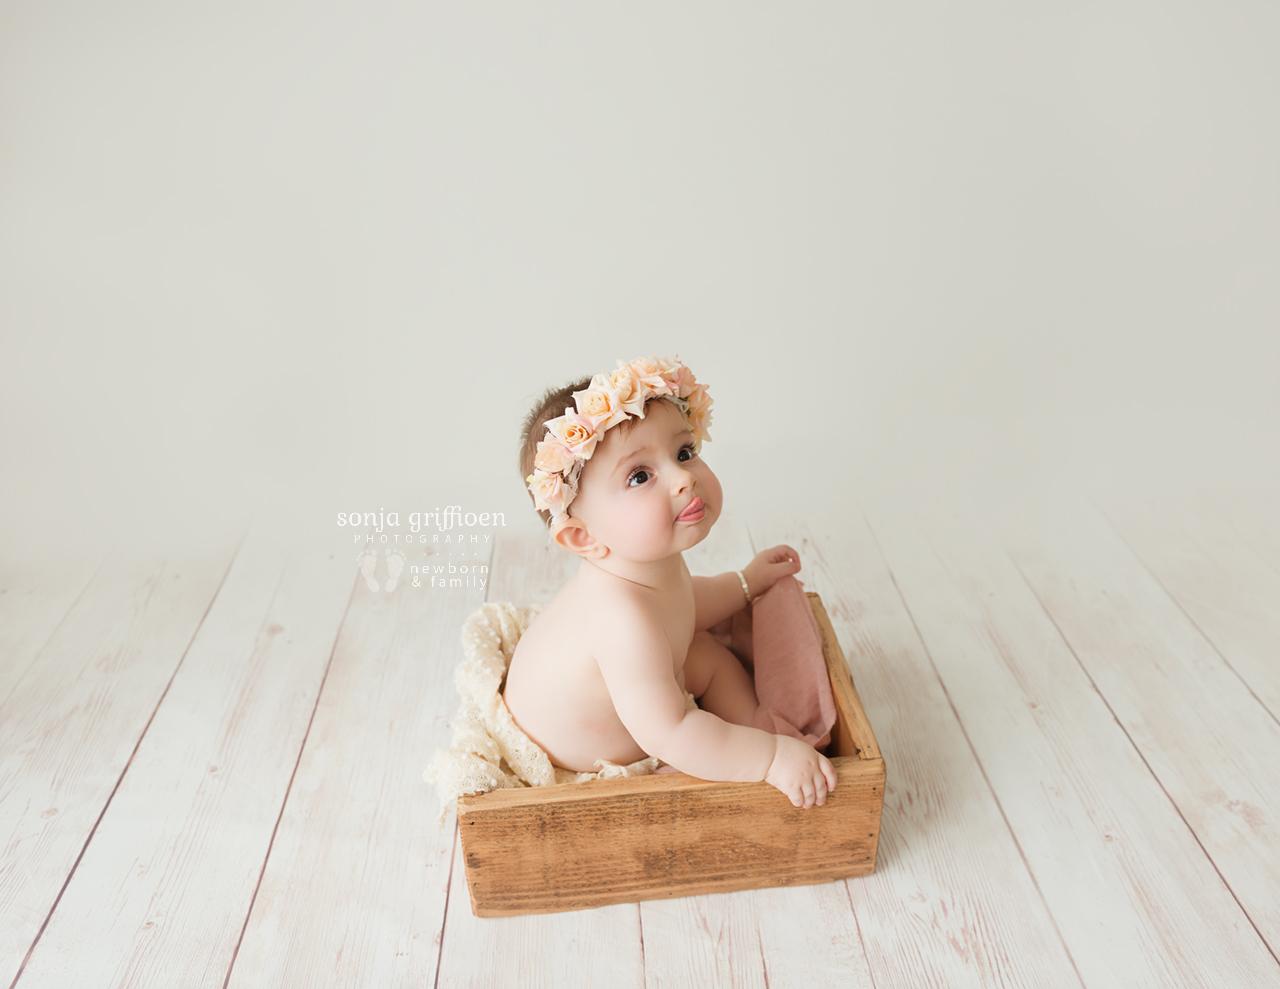 Annabella-Milestone-Brisbane-Baby-Photographer-Sonja-Griffioen-08.jpg